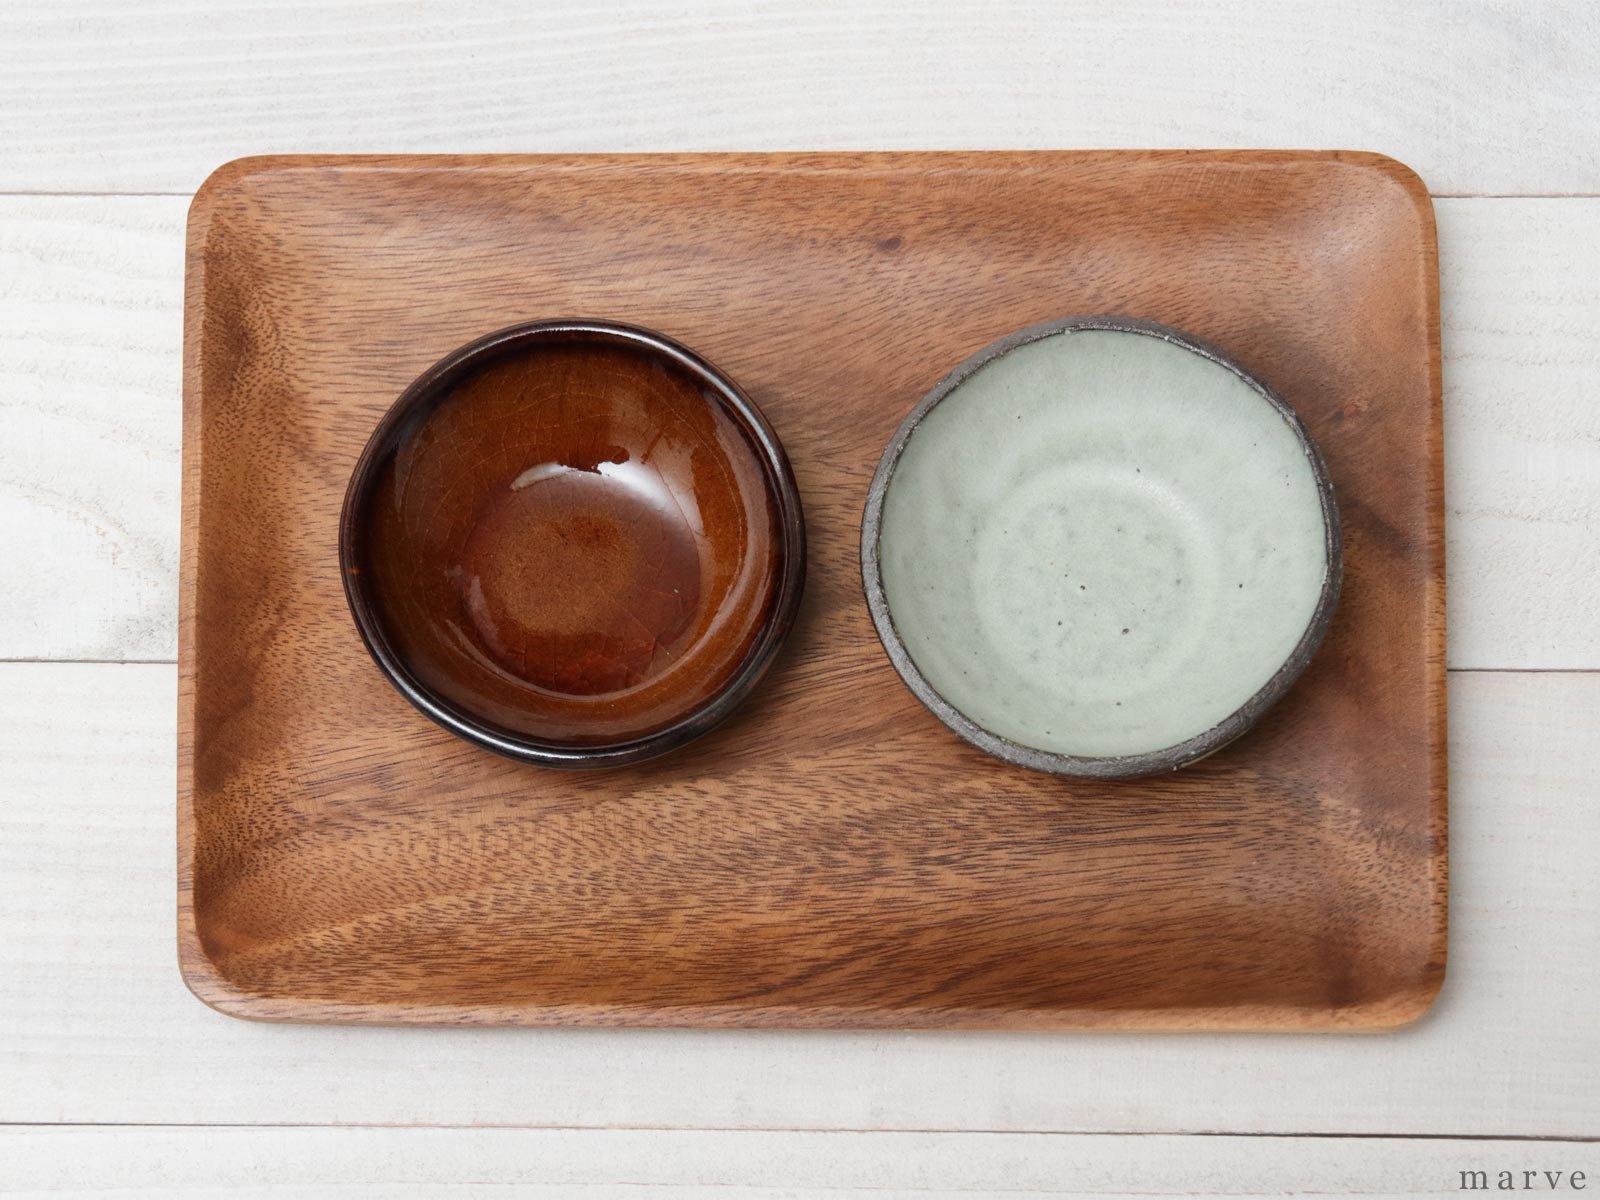 caramel(カラメル)豆皿 丸  柴田サヤカ